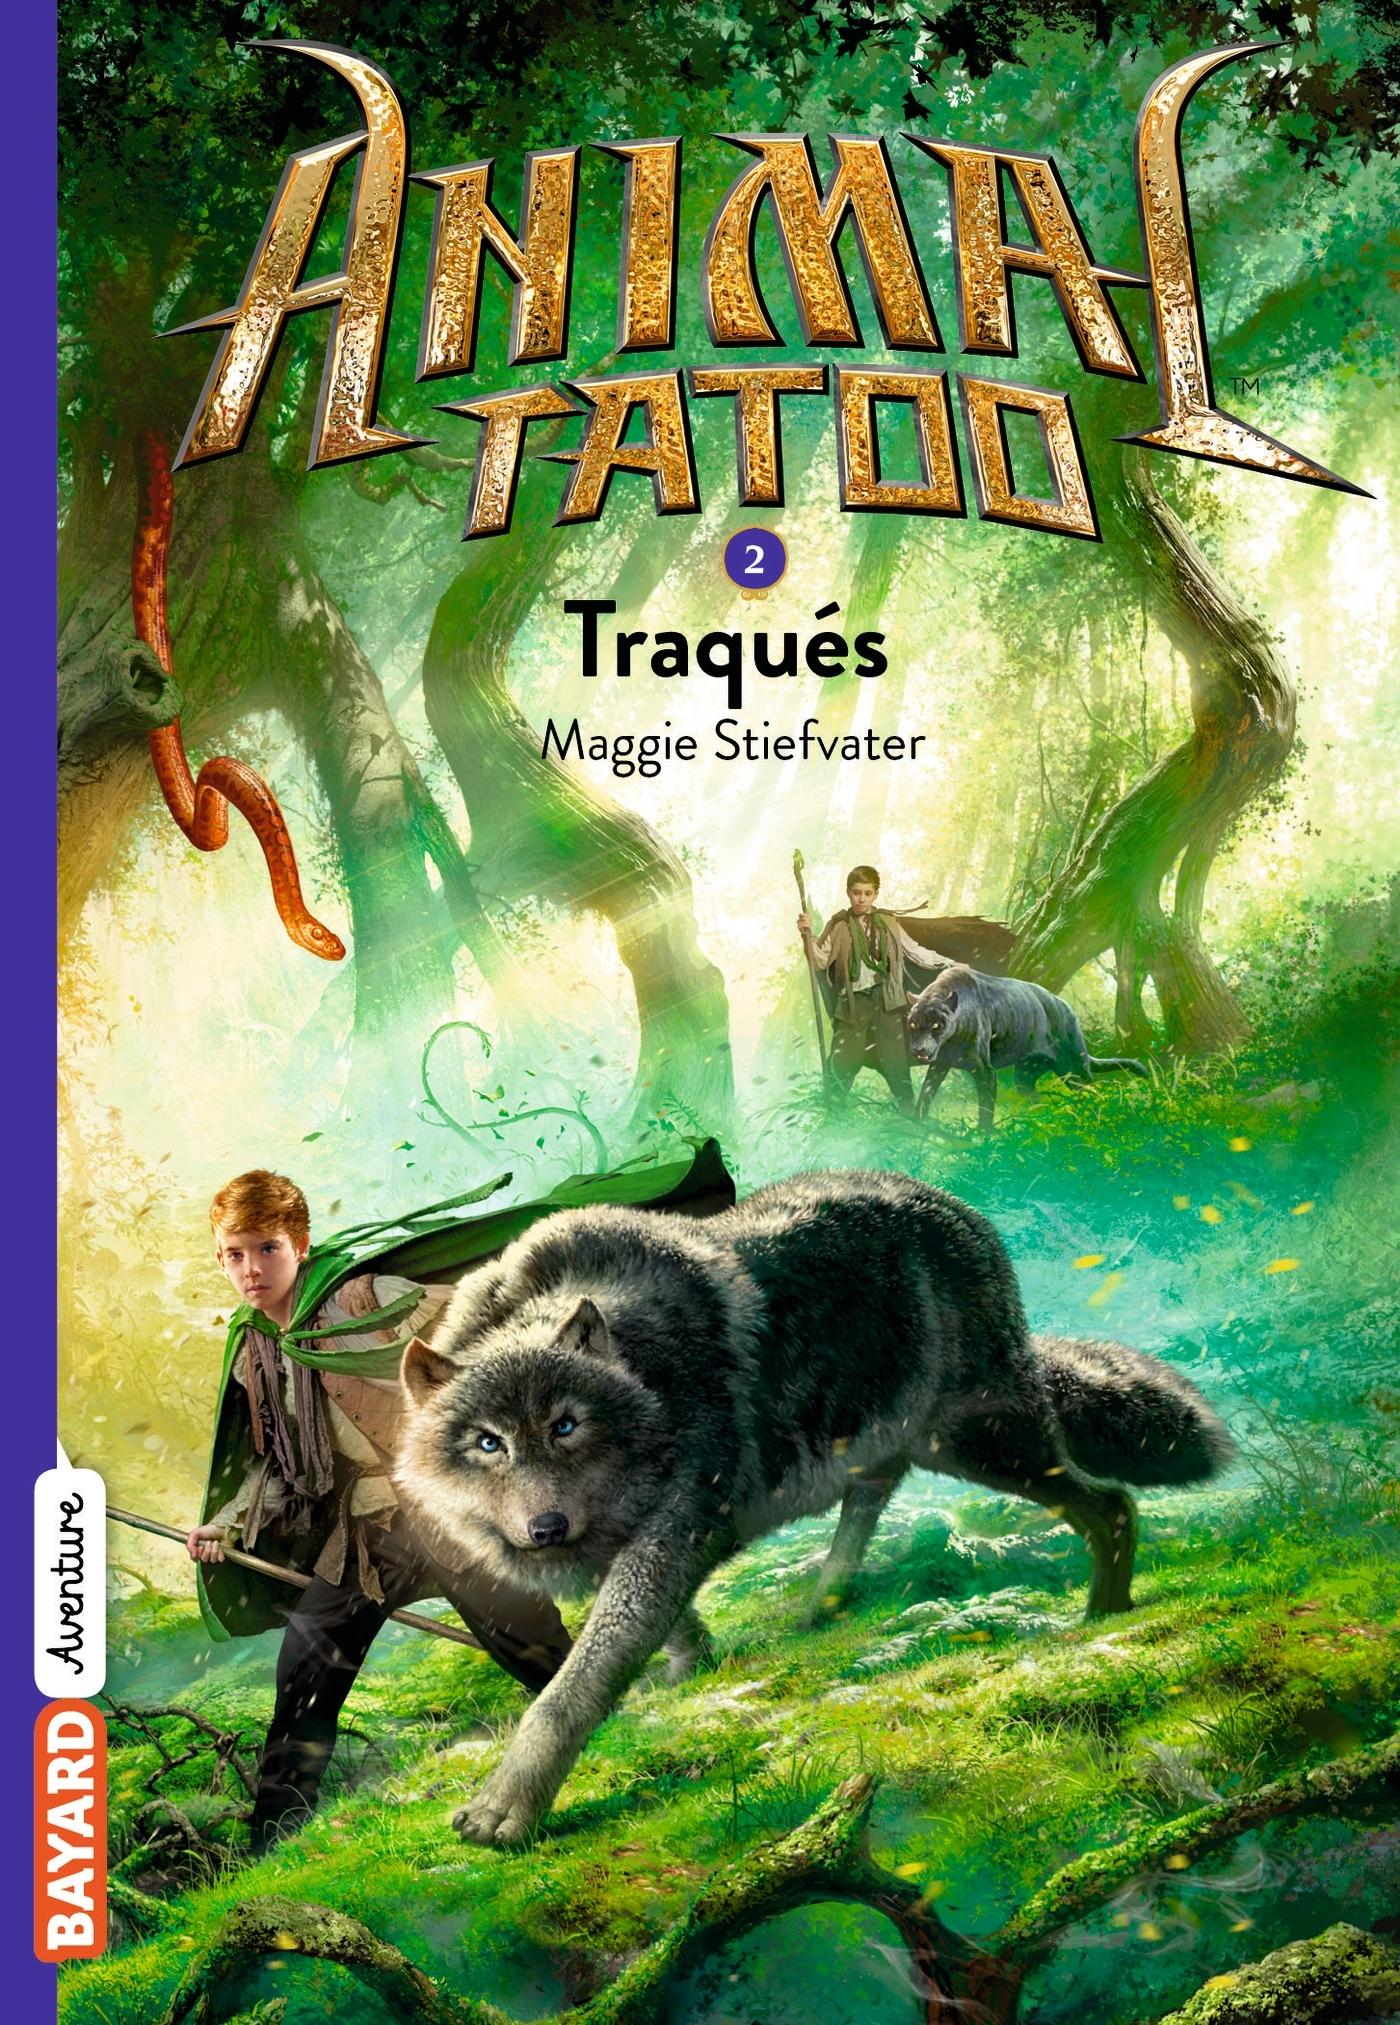 ANIMAL TATOO POCHE SAISON 1, TOME 02 - TRAQUES